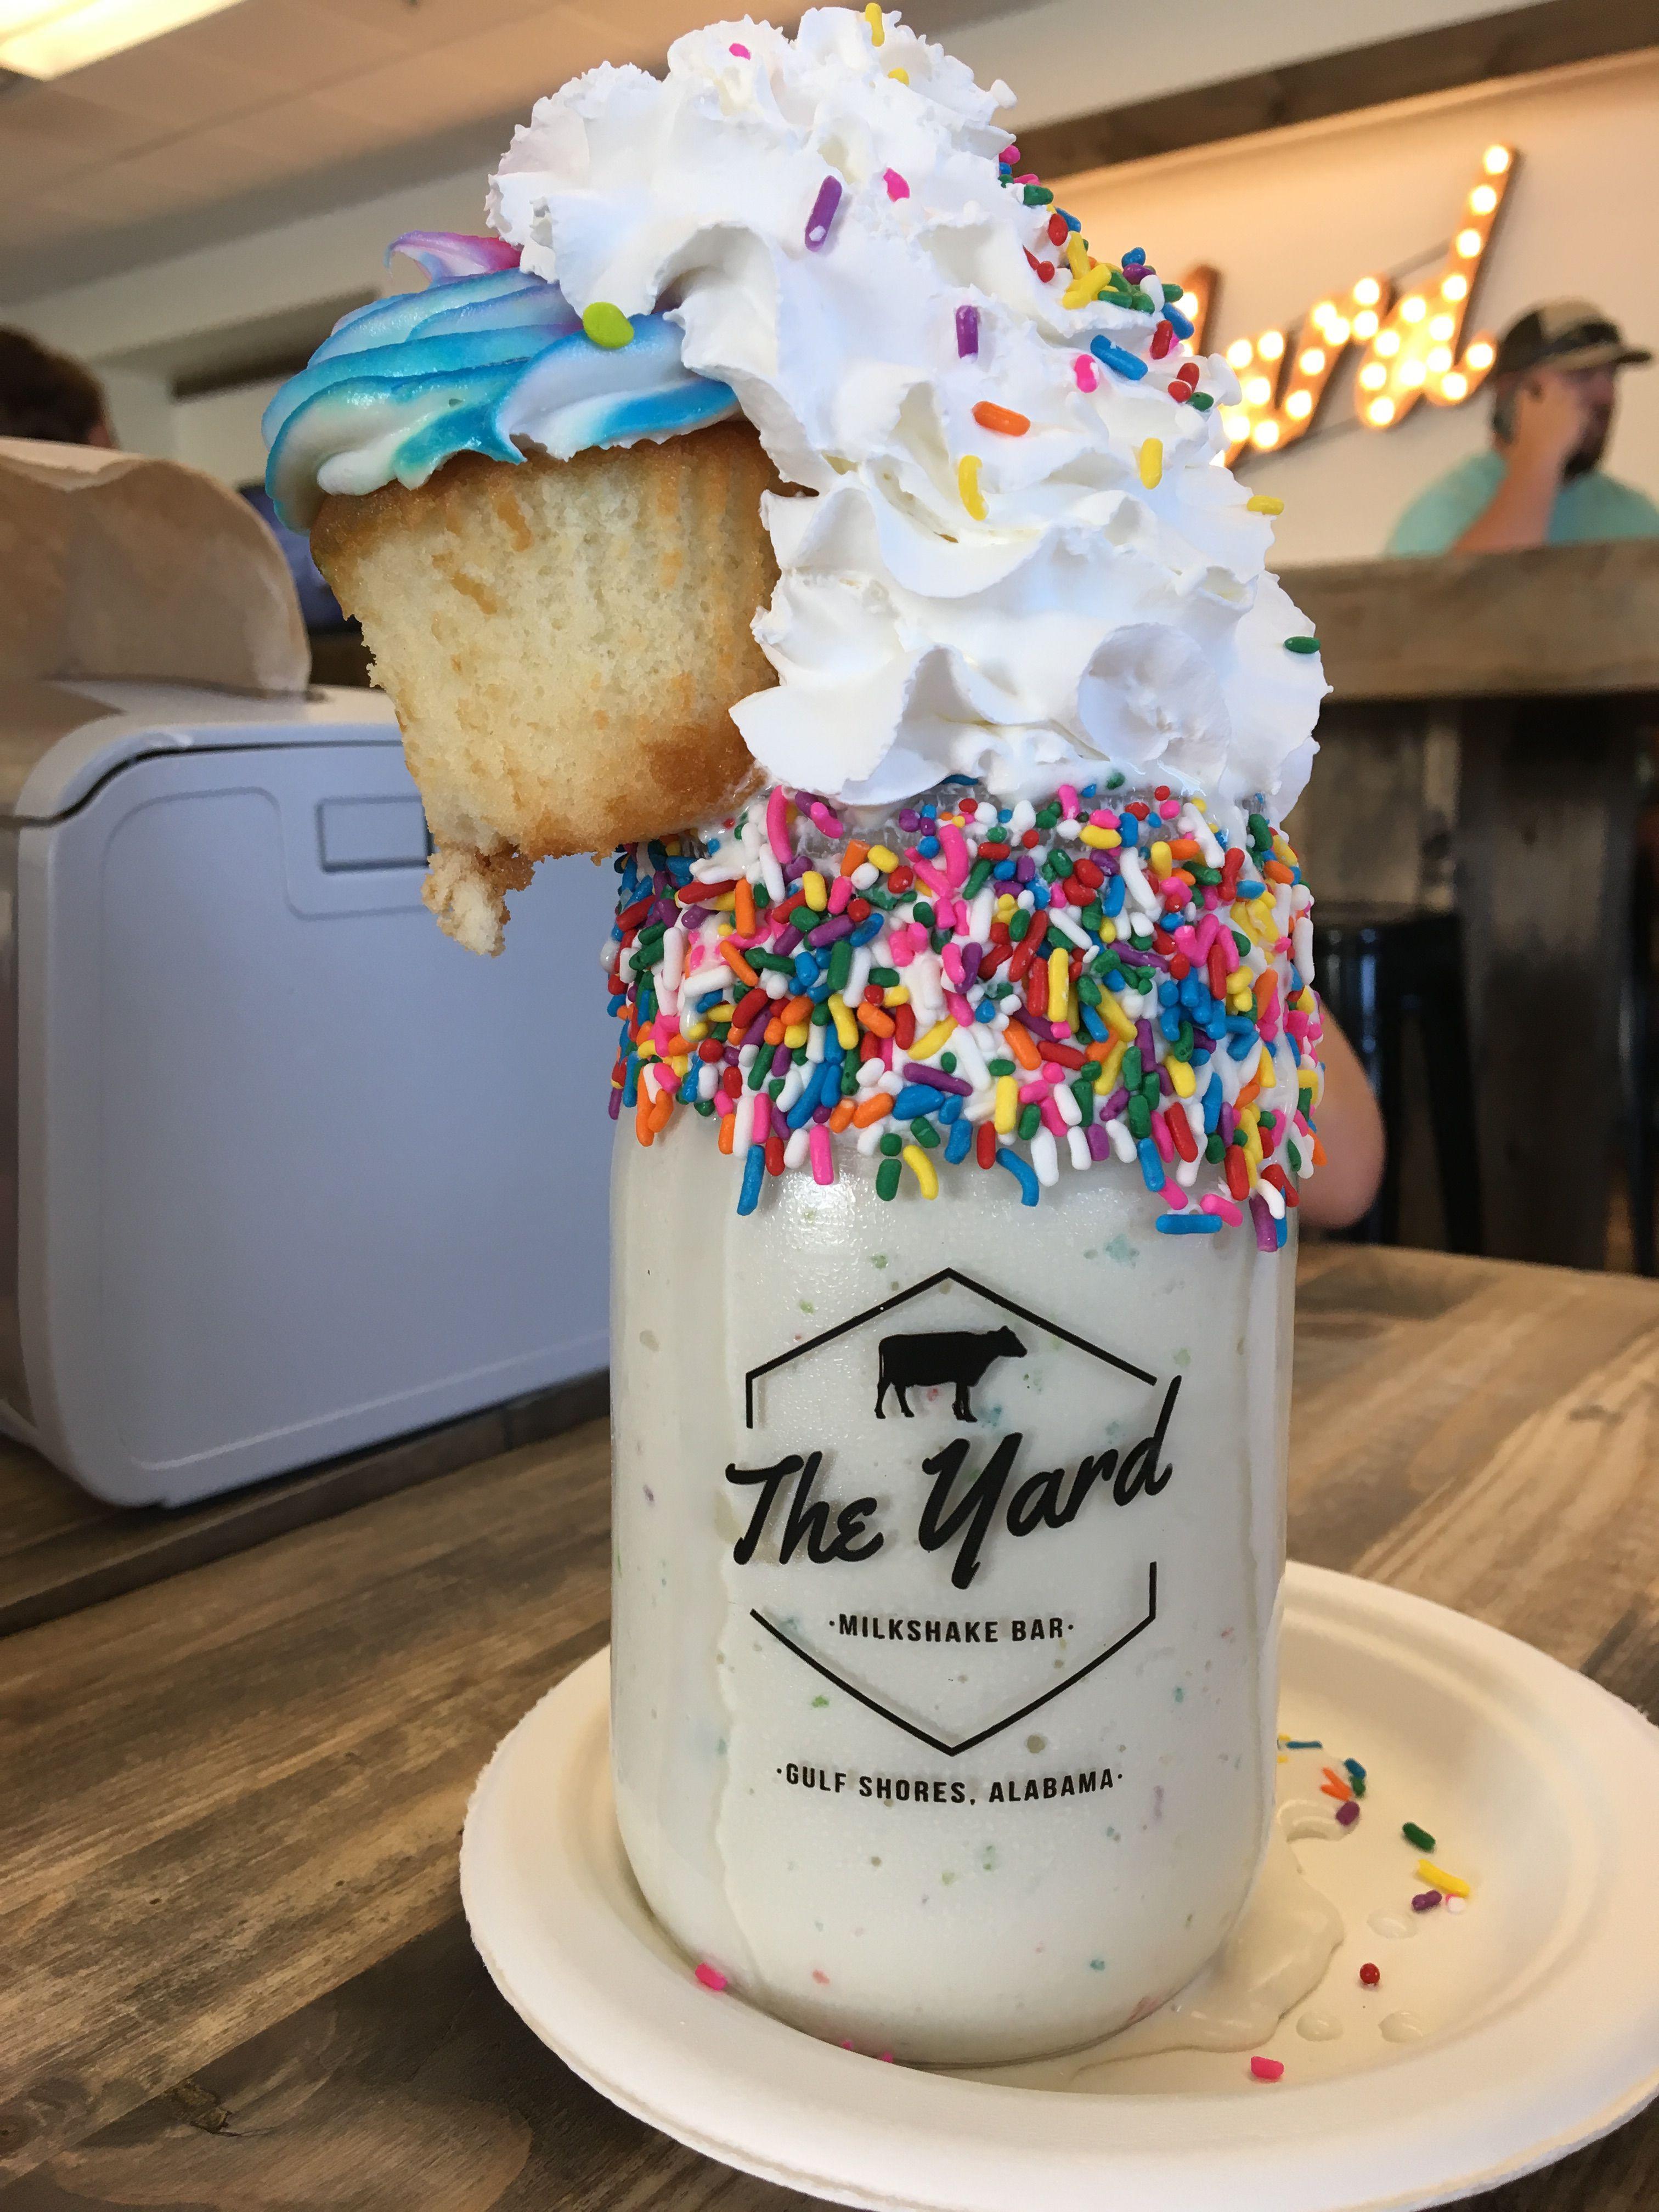 The Yard Milkshake Bar Gulf Shores Al Food Drinks Dessert Yummy Food Dessert Fun Desserts